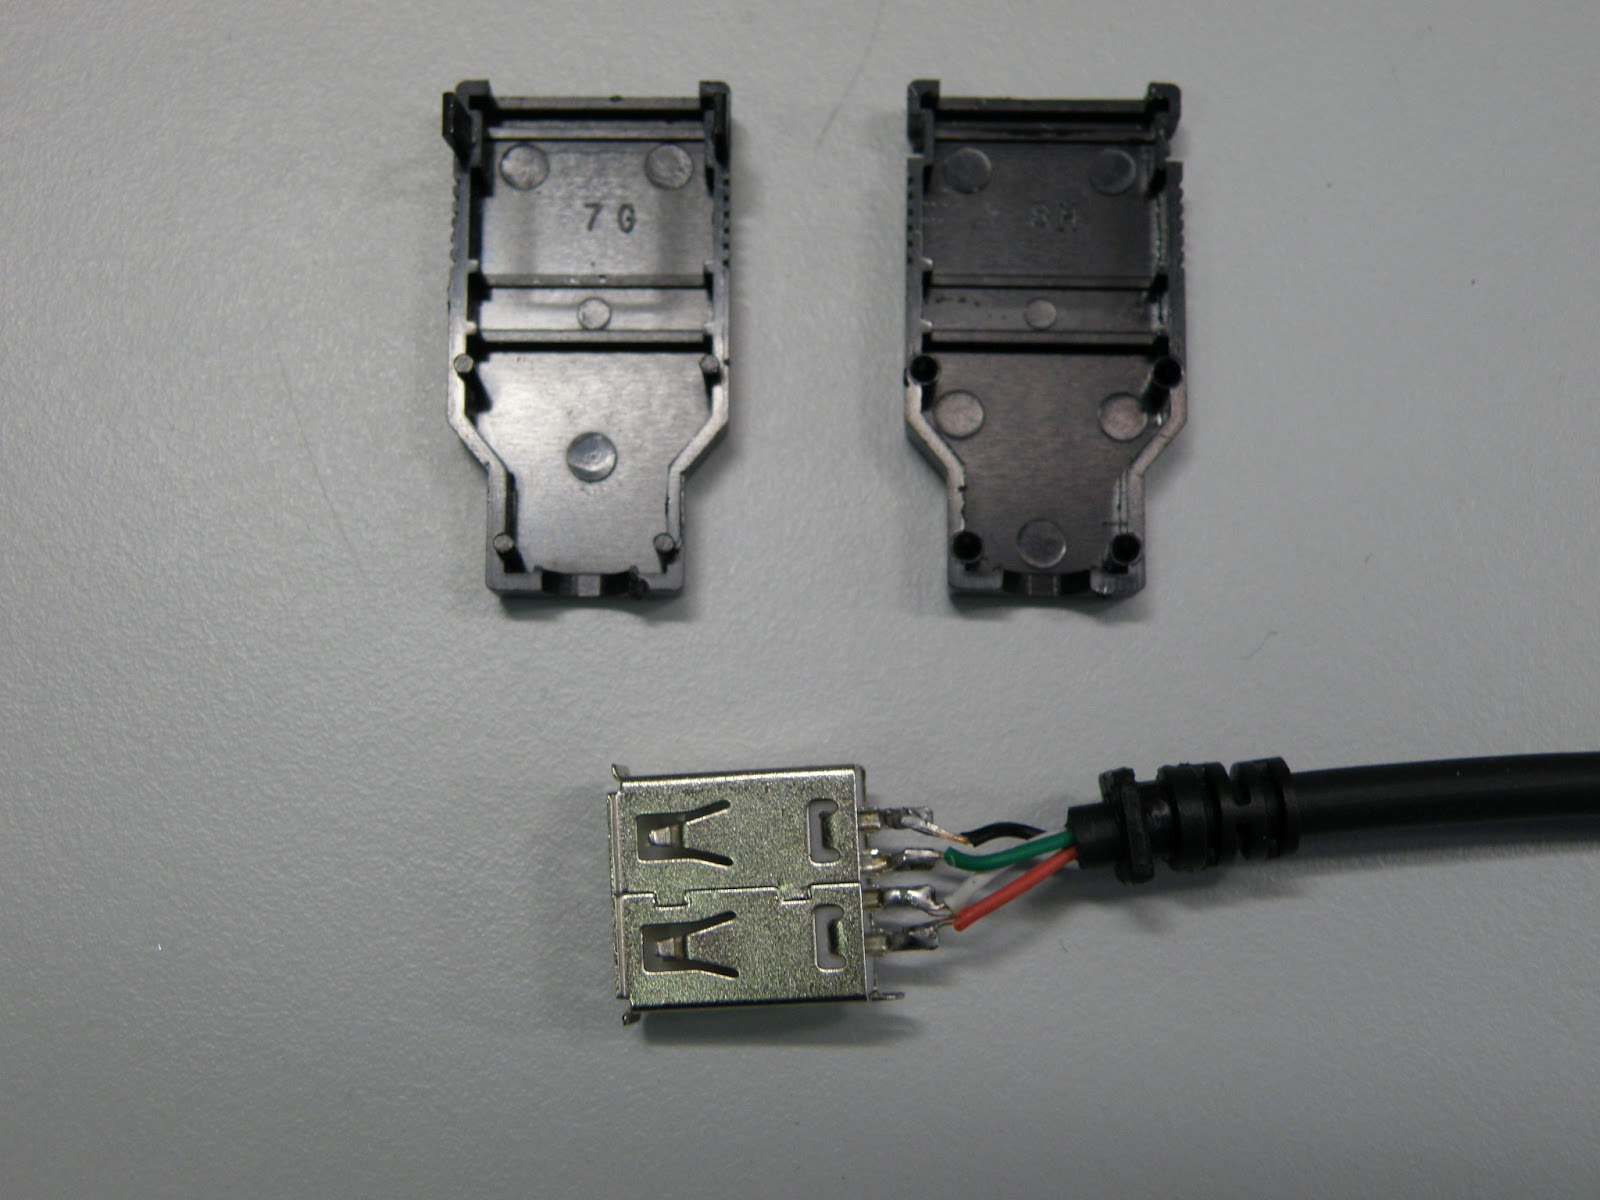 P7131763 alexey s lavrov ���� 2012,Female Usb To Db9 Wiring